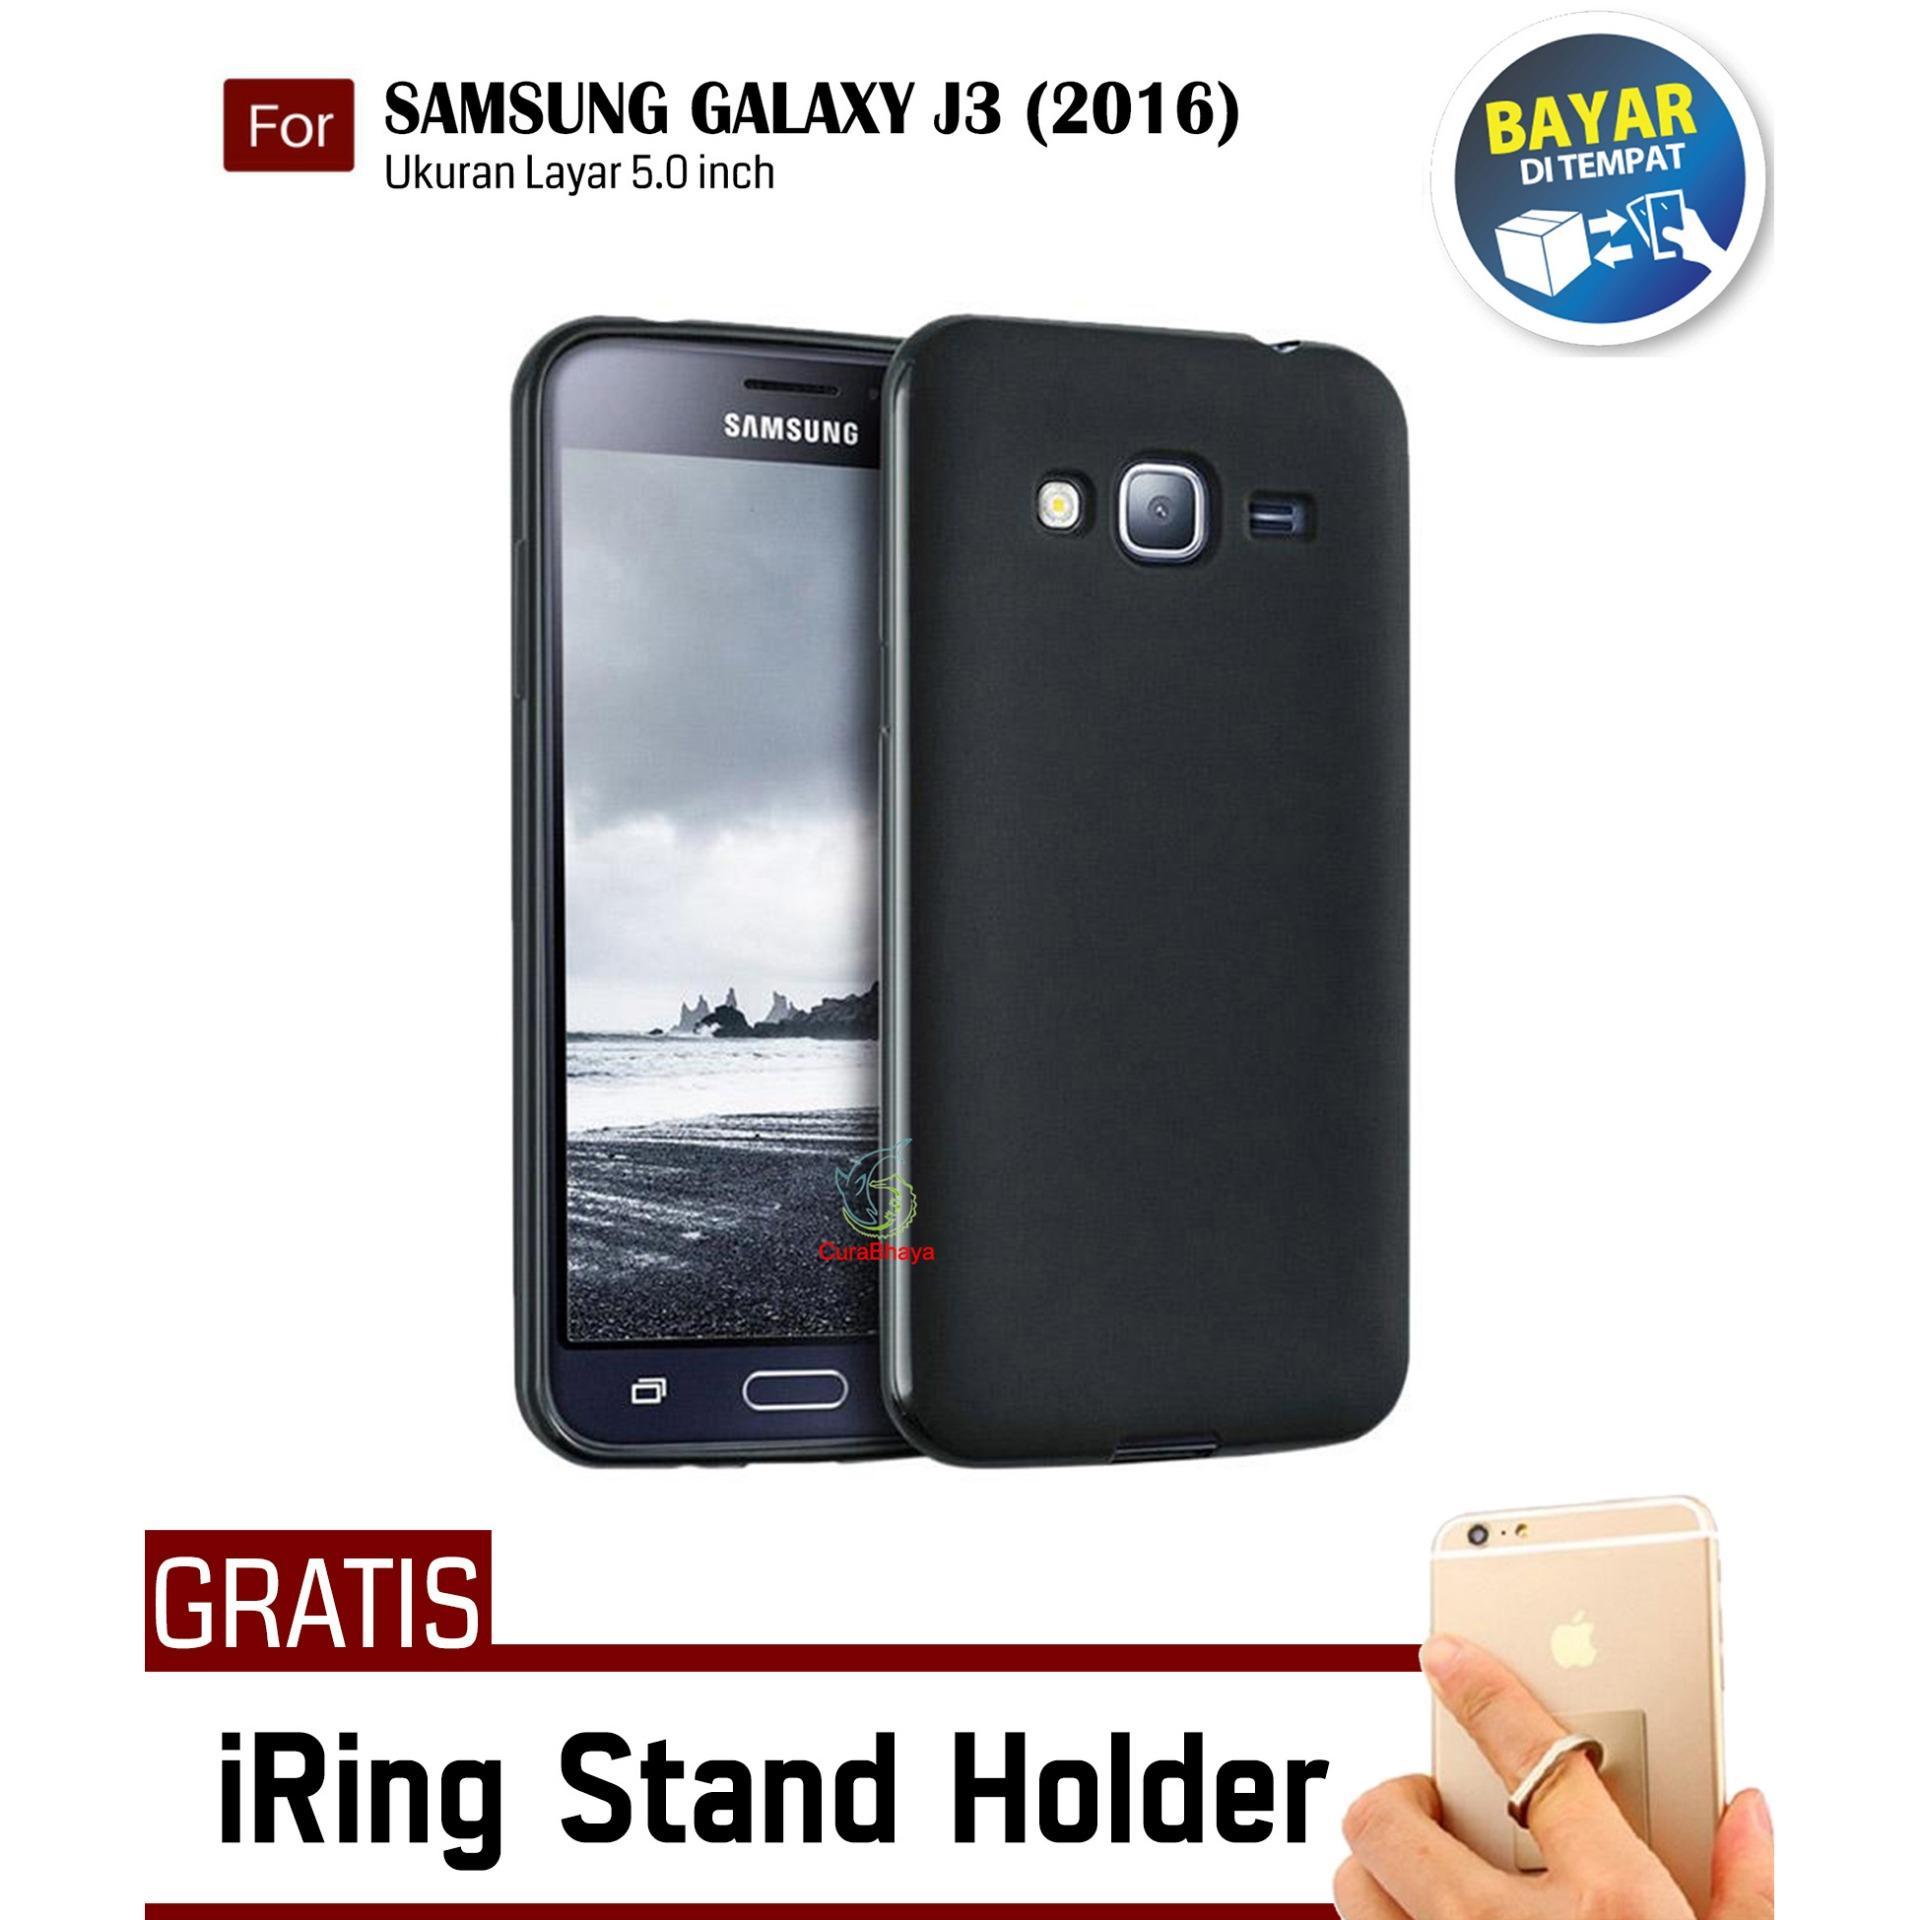 MidNight Samsung Galaxy J3 / J300 / J310 / J320 / Duos| Slim Case Black